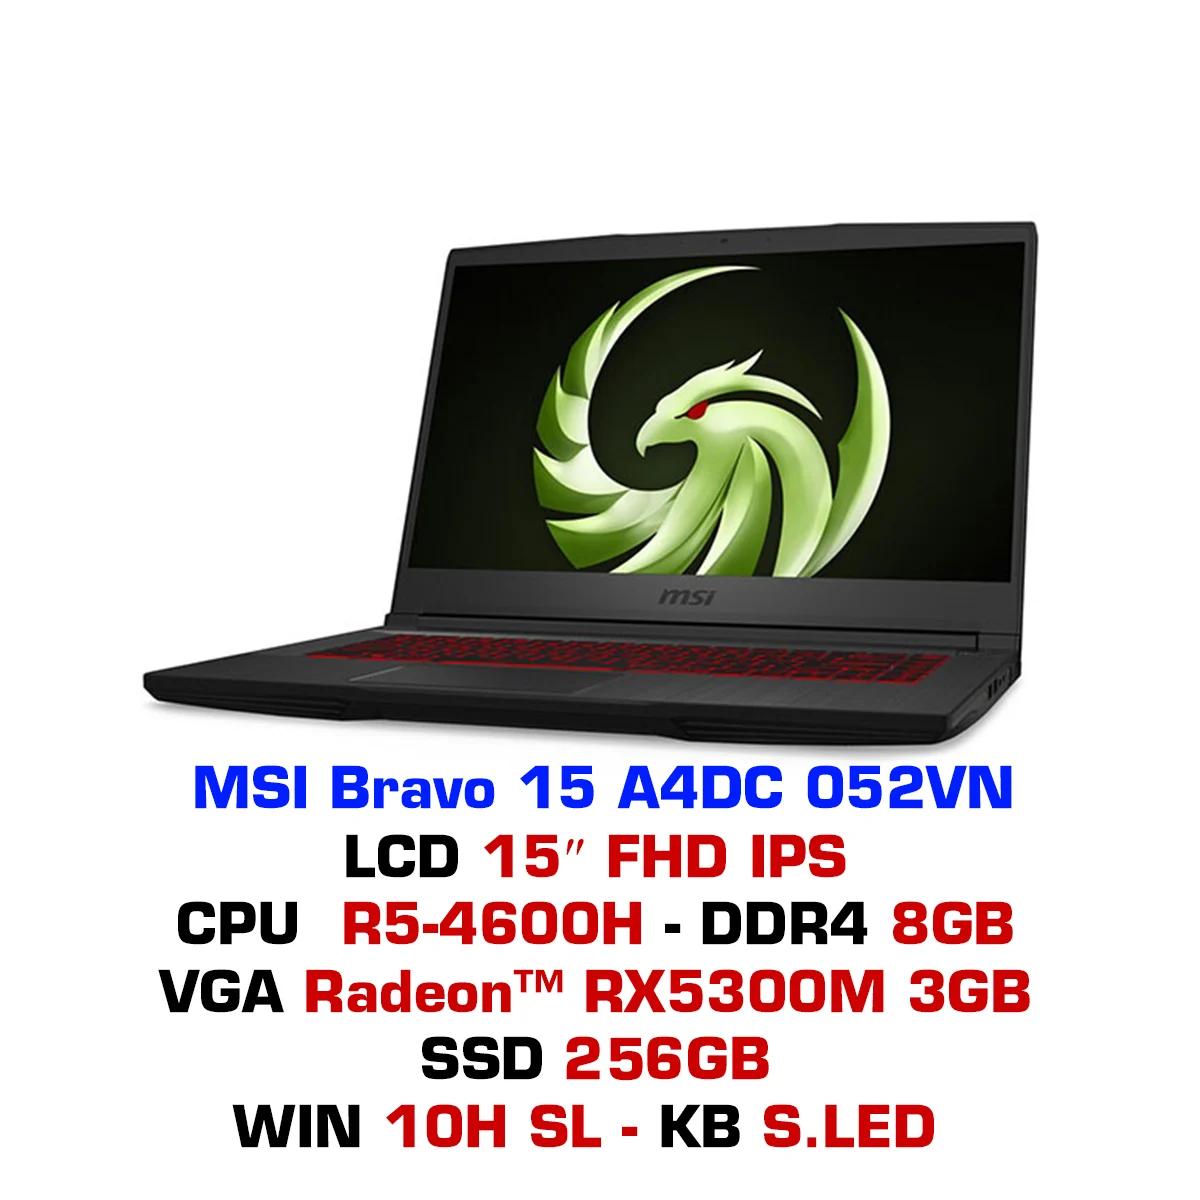 MSI Bravo 15 A4DC 052VN - Ryzen 5 4600H